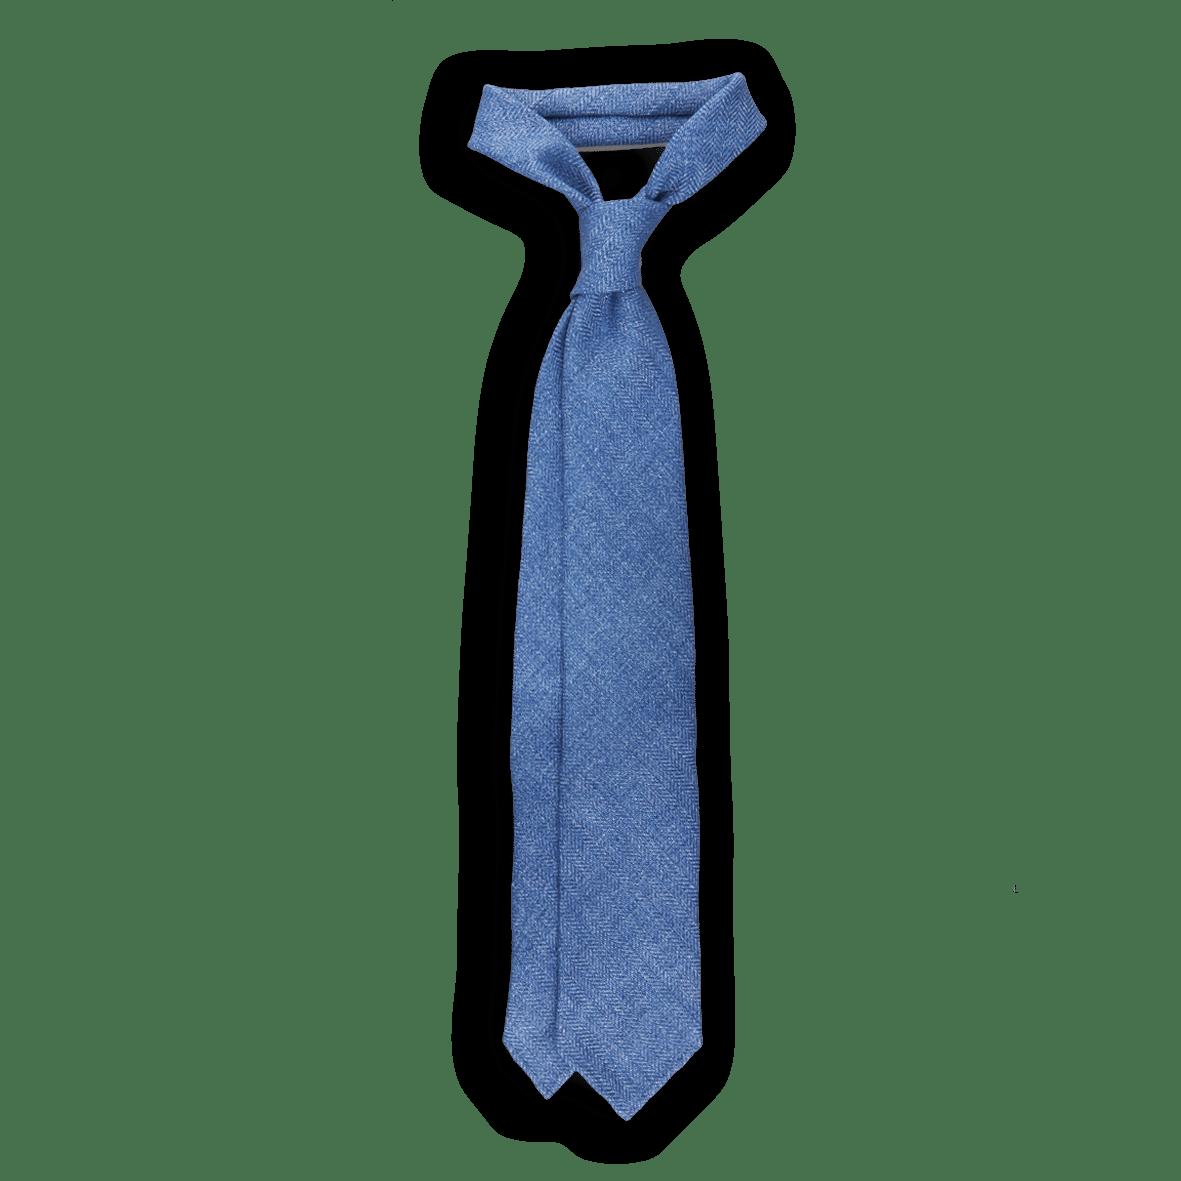 Drakes Blue Chevron Woven Linen Tie Feature